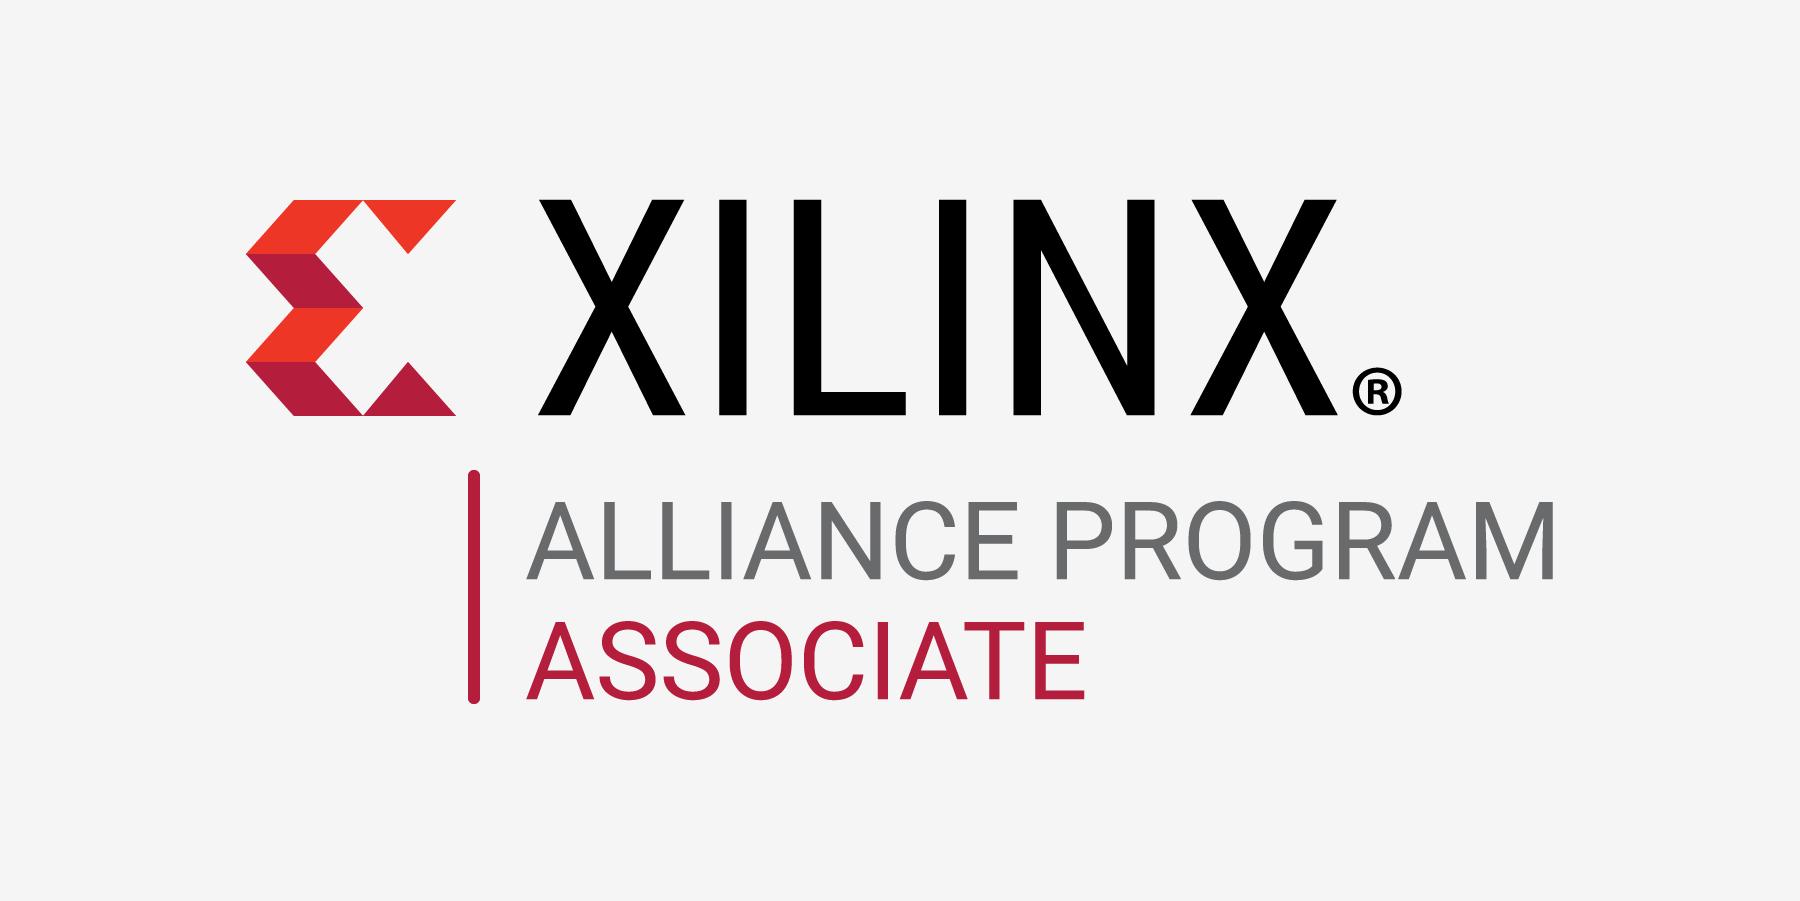 xilinx-badge@3x.png